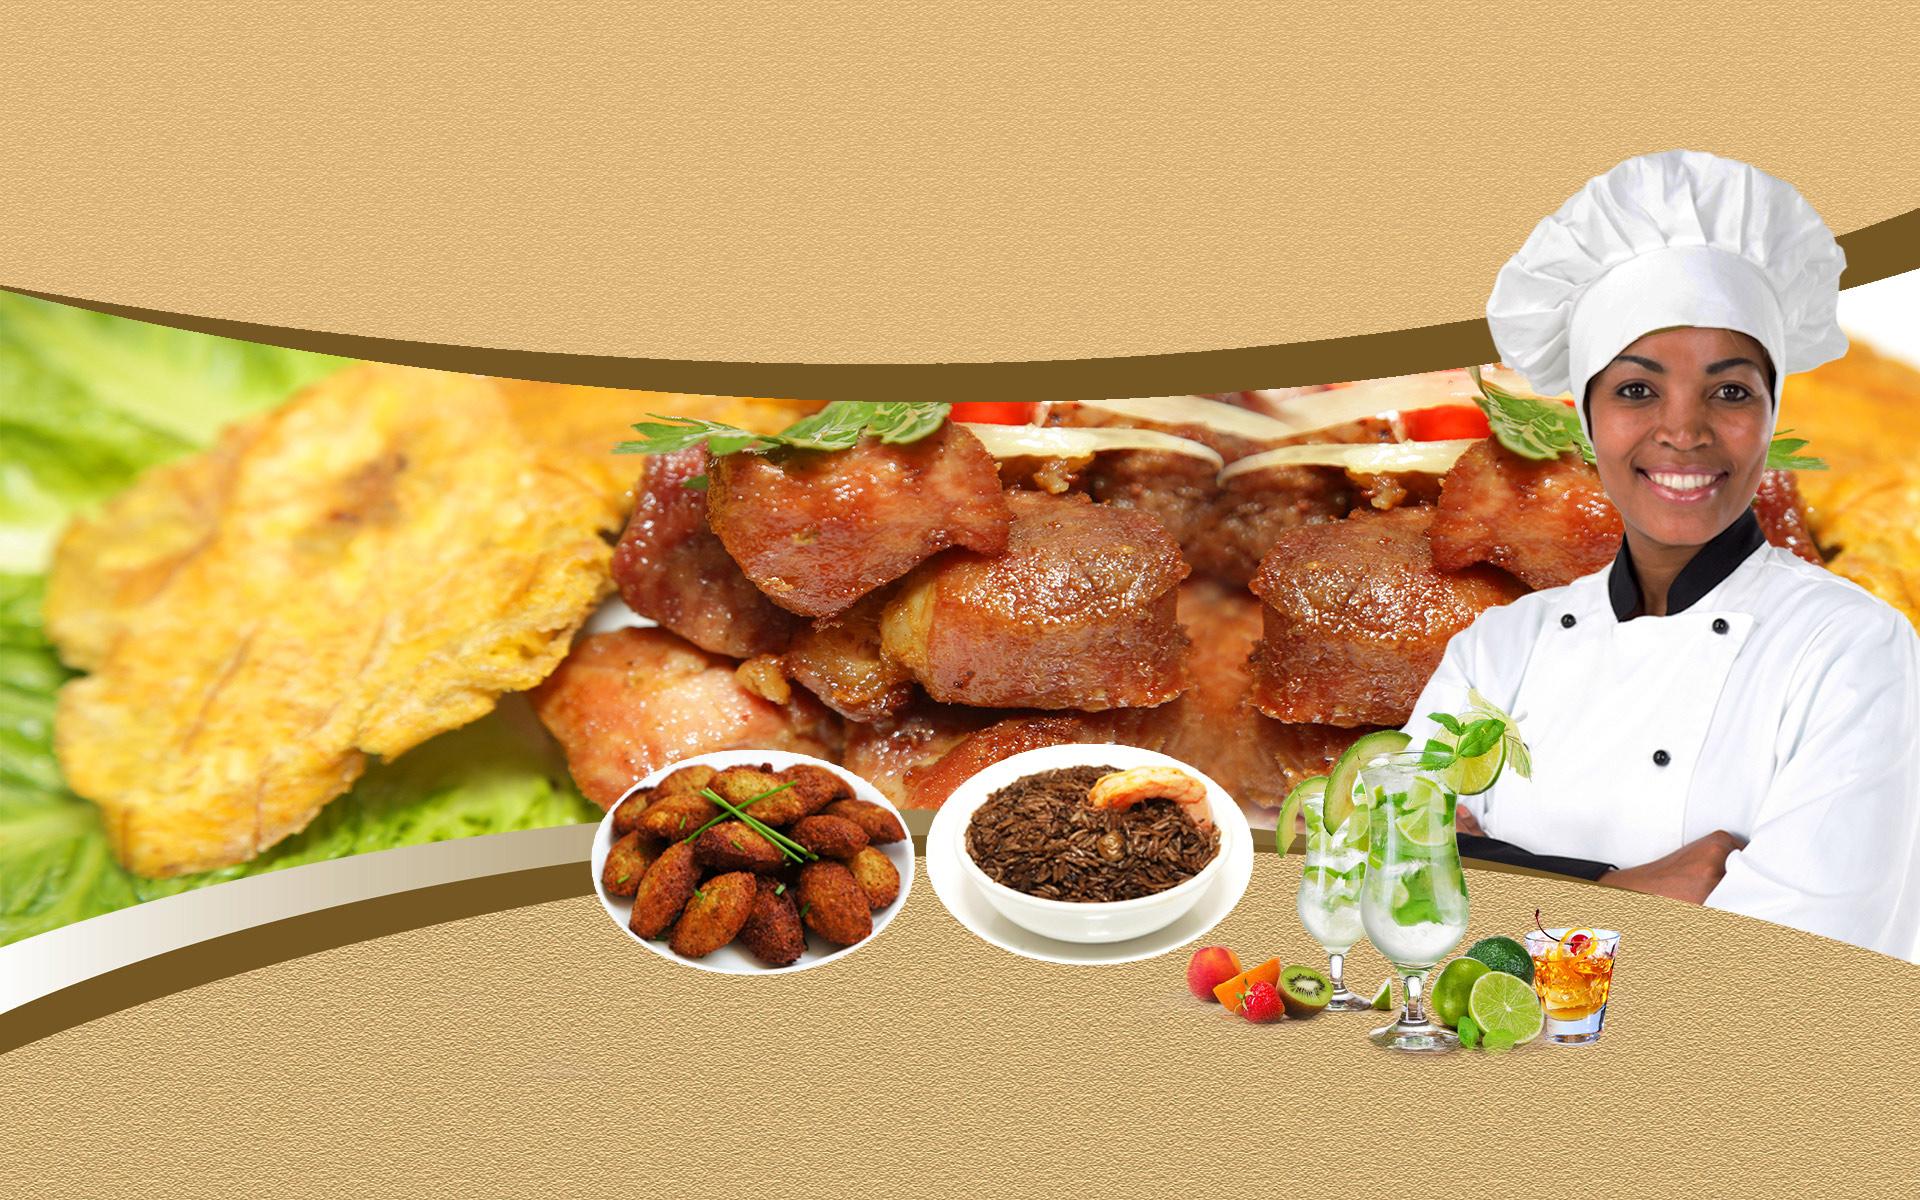 Cuisine Haitienne Stunning Restaurant Antillais Montreal With Cuisine Haitienne Nous Contacter